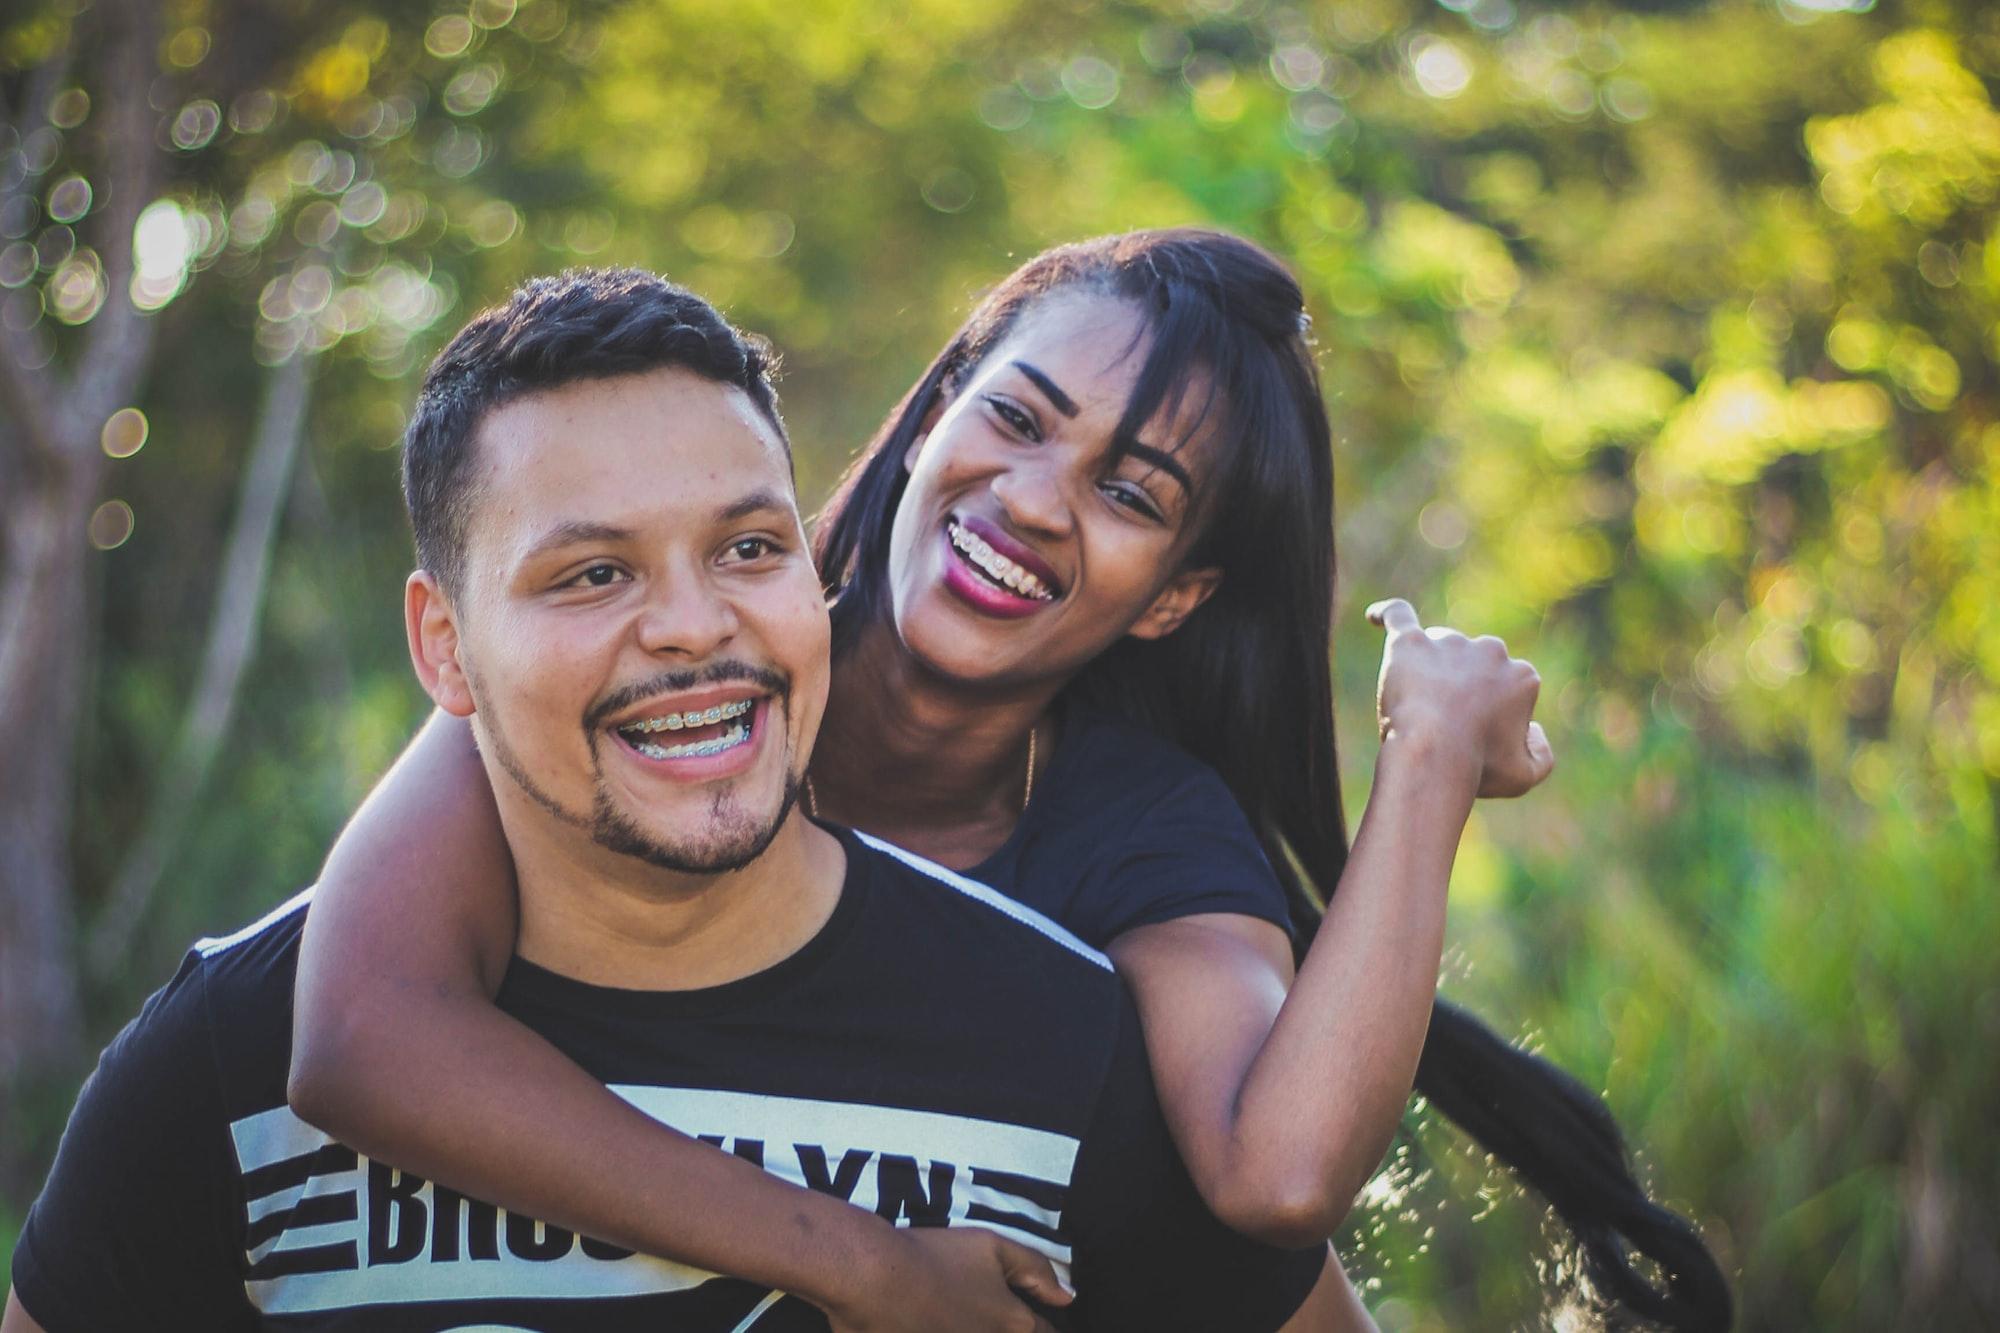 8 fun bonding activities for married couples